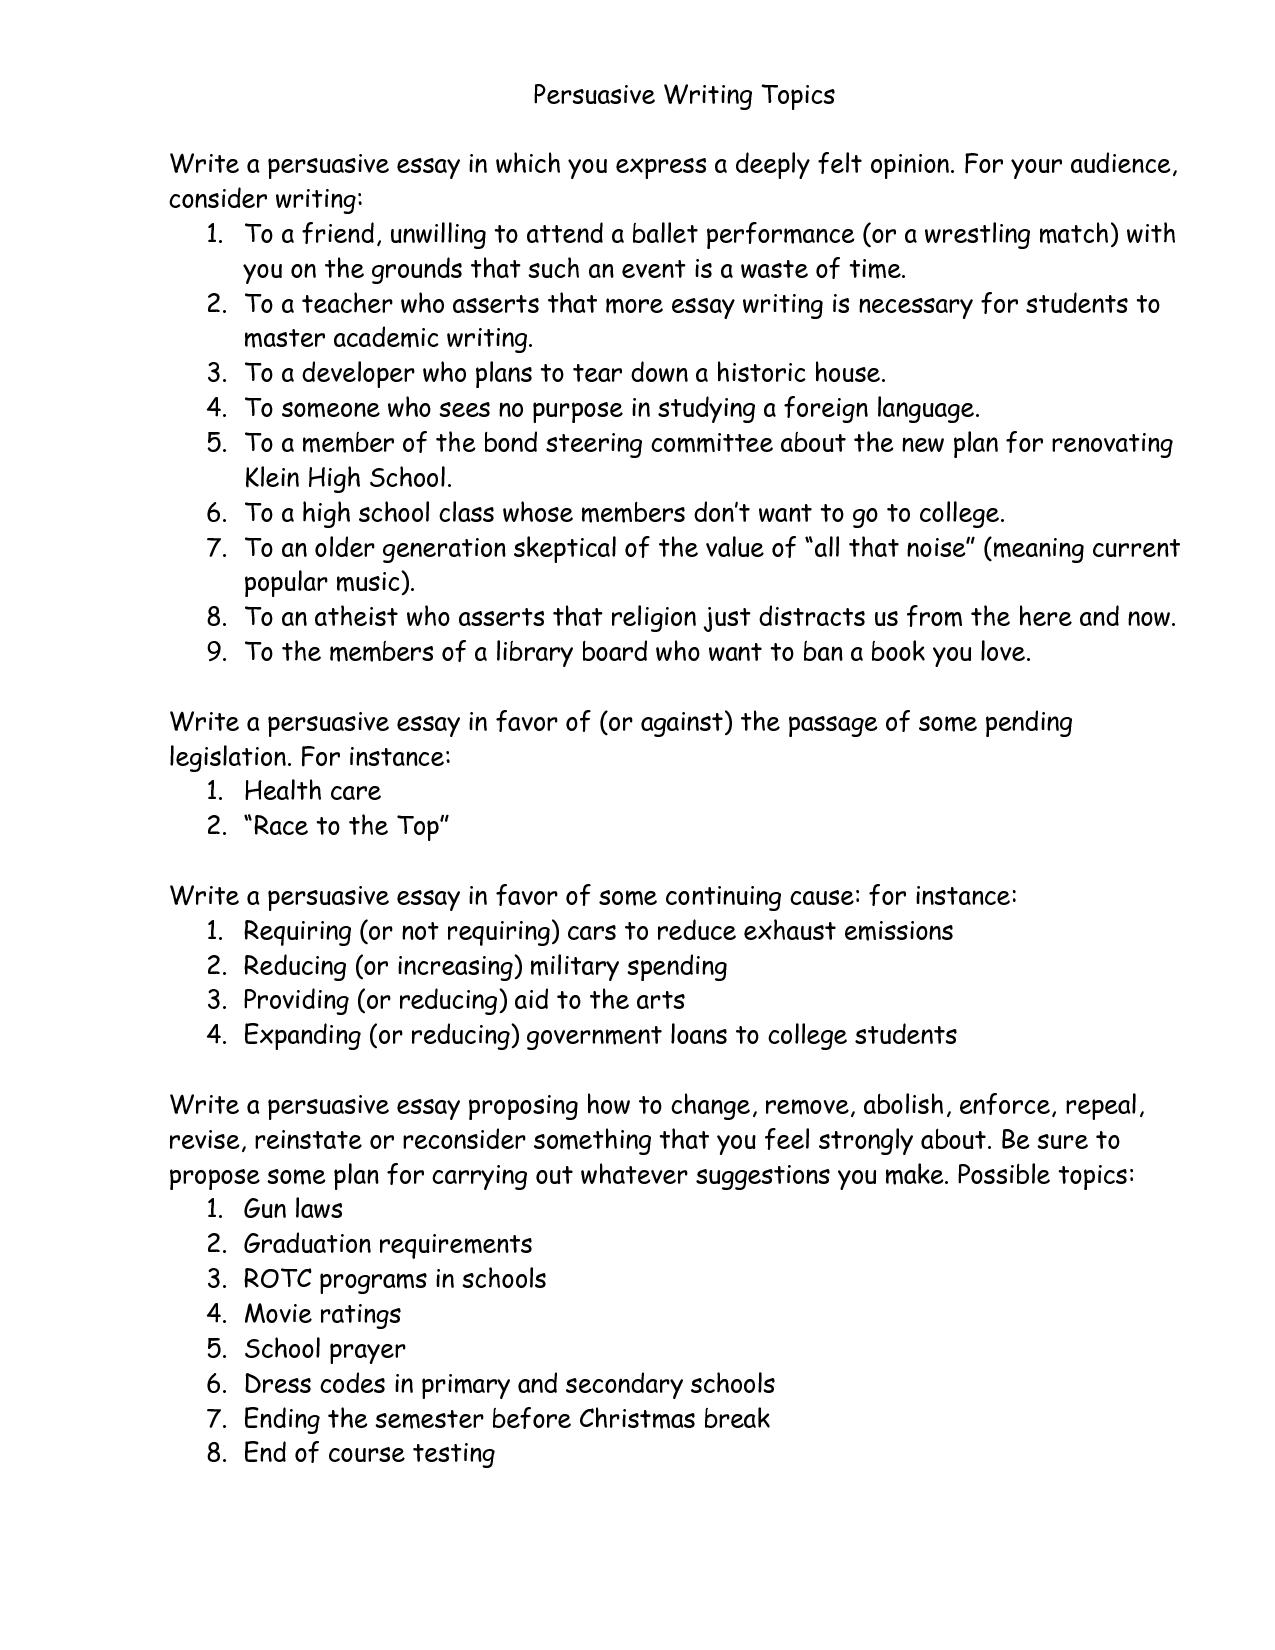 003 Essay Example Mfrv3azzsf Good Persuasive Amazing Topics For College Argumentative High School Full